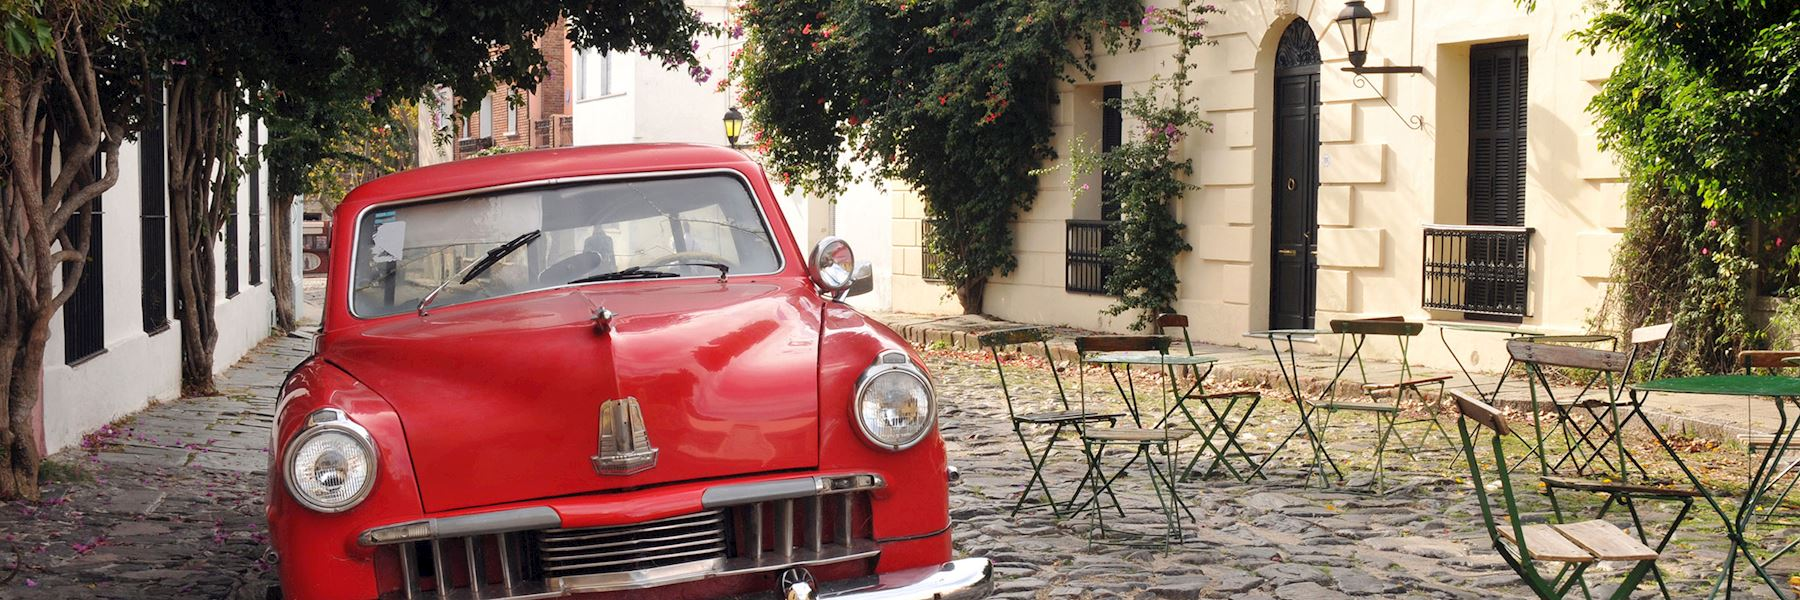 Uruguay vacations